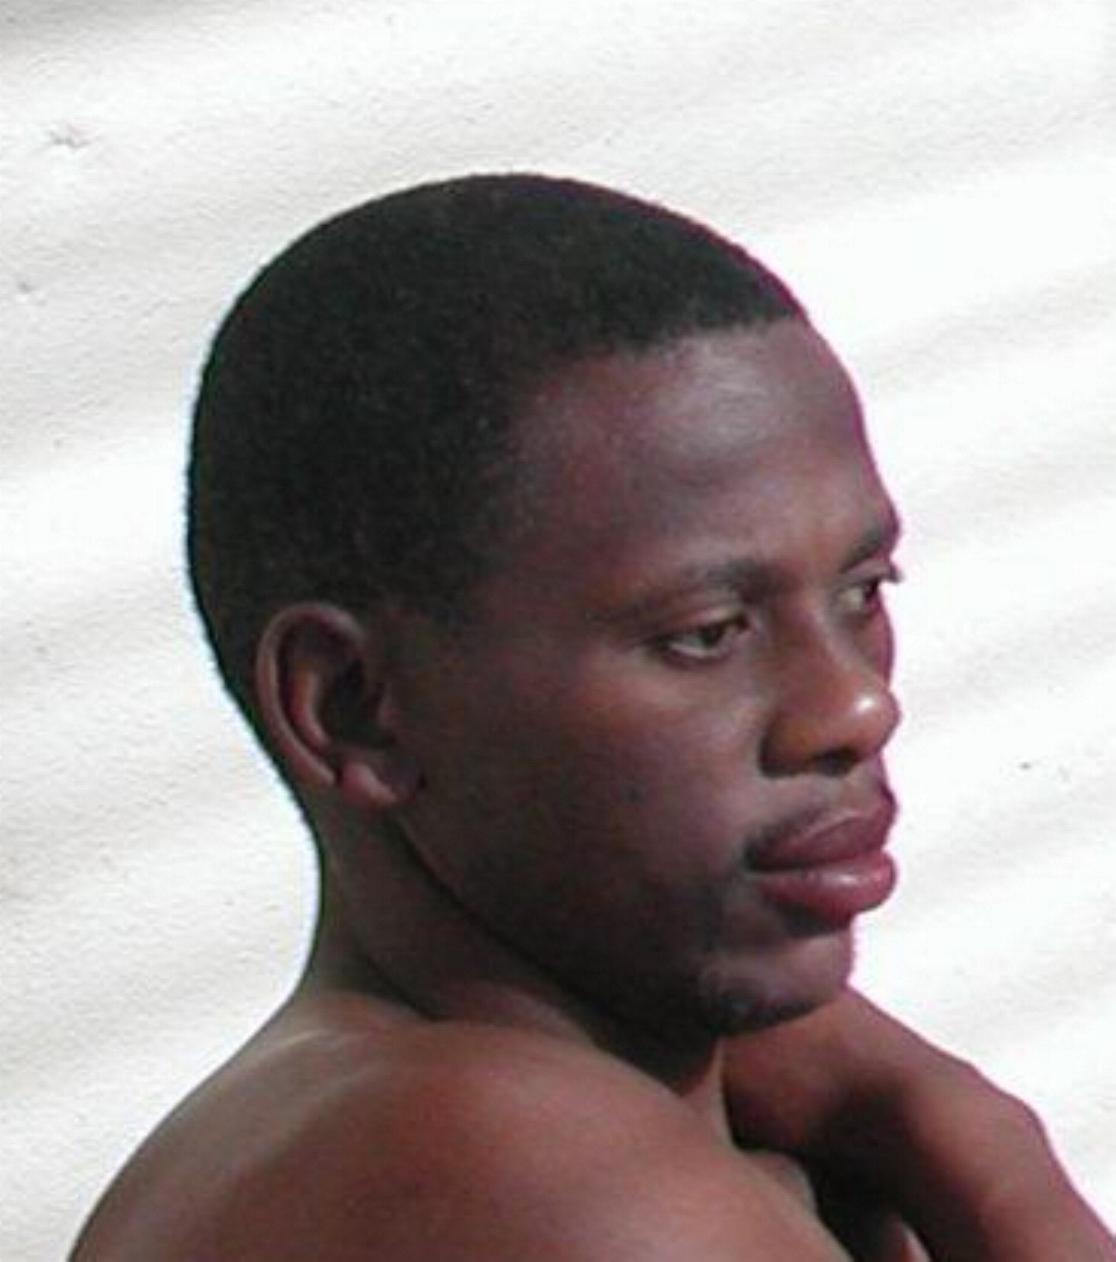 http://2.bp.blogspot.com/-cpZoYdTRSk0/Tl7EWfCYgvI/AAAAAAAADRc/m5joTHqyUbc/s1600/EricShabalala_AS.jpg